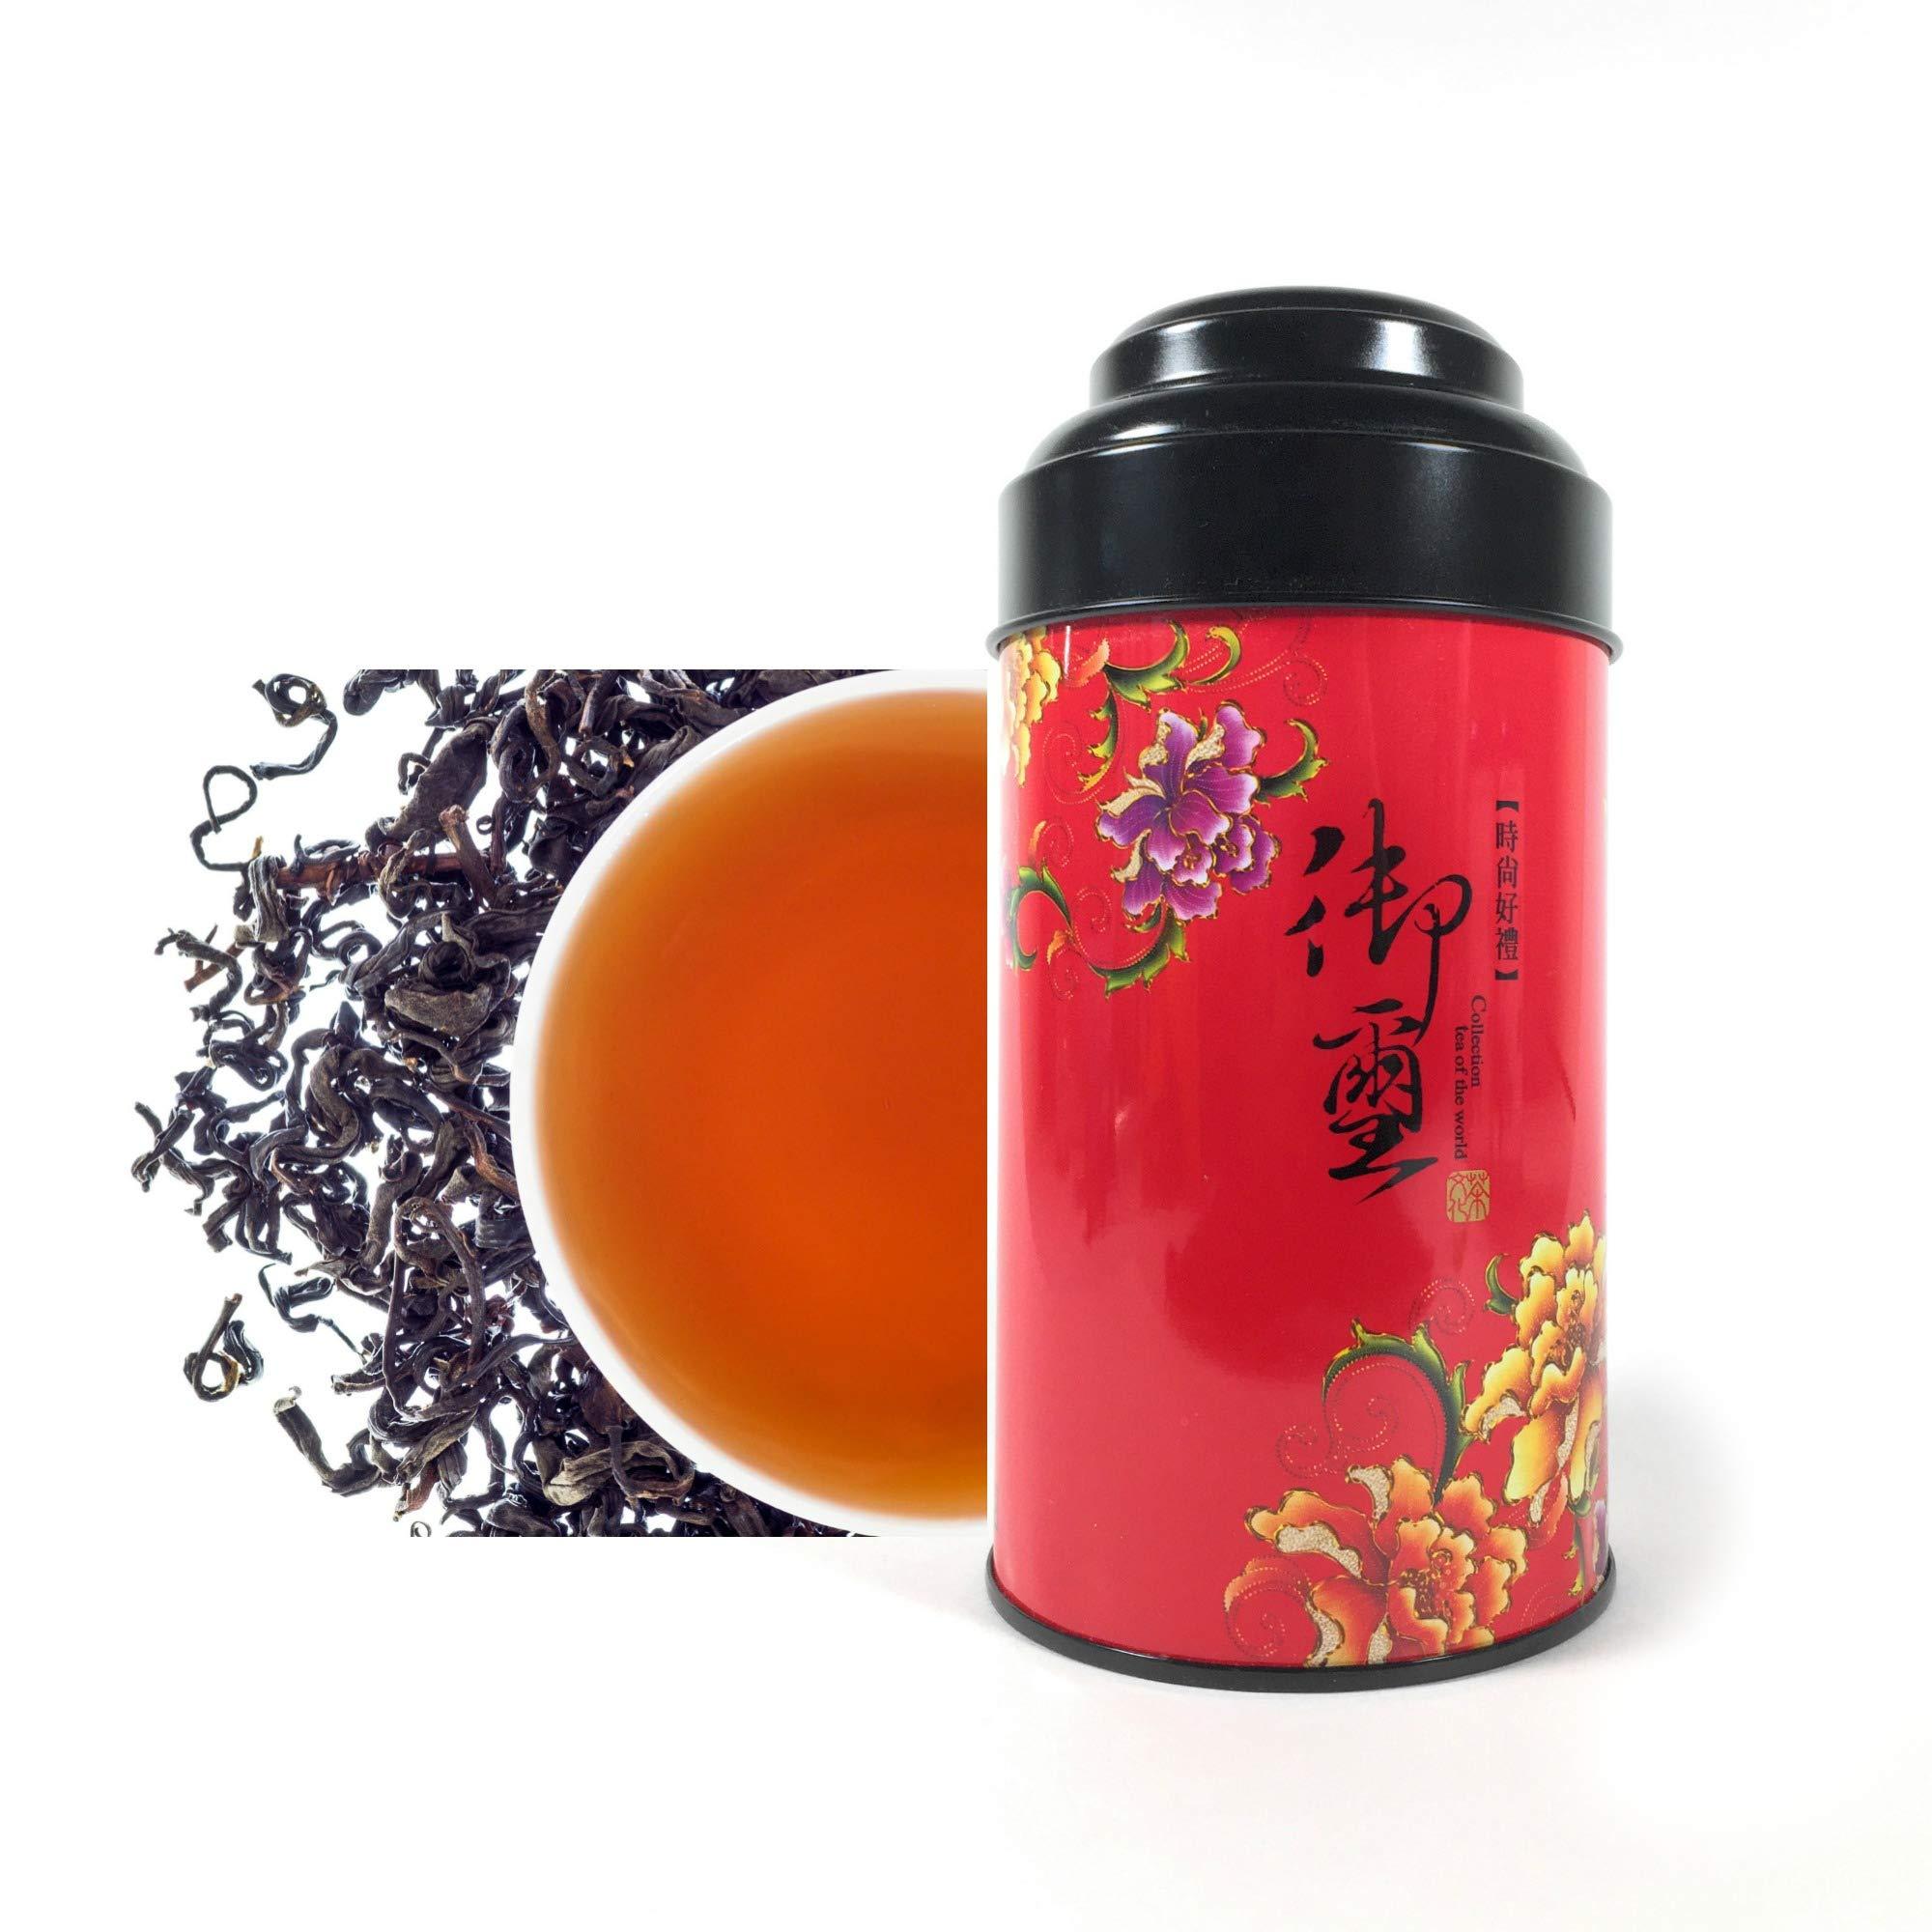 Taiwan Oolong Tea Red Oolong 2018 Fresh Harvest Natural Whole Loose Leaf Tea No Additives Genuine Taiwanese Farm Direct